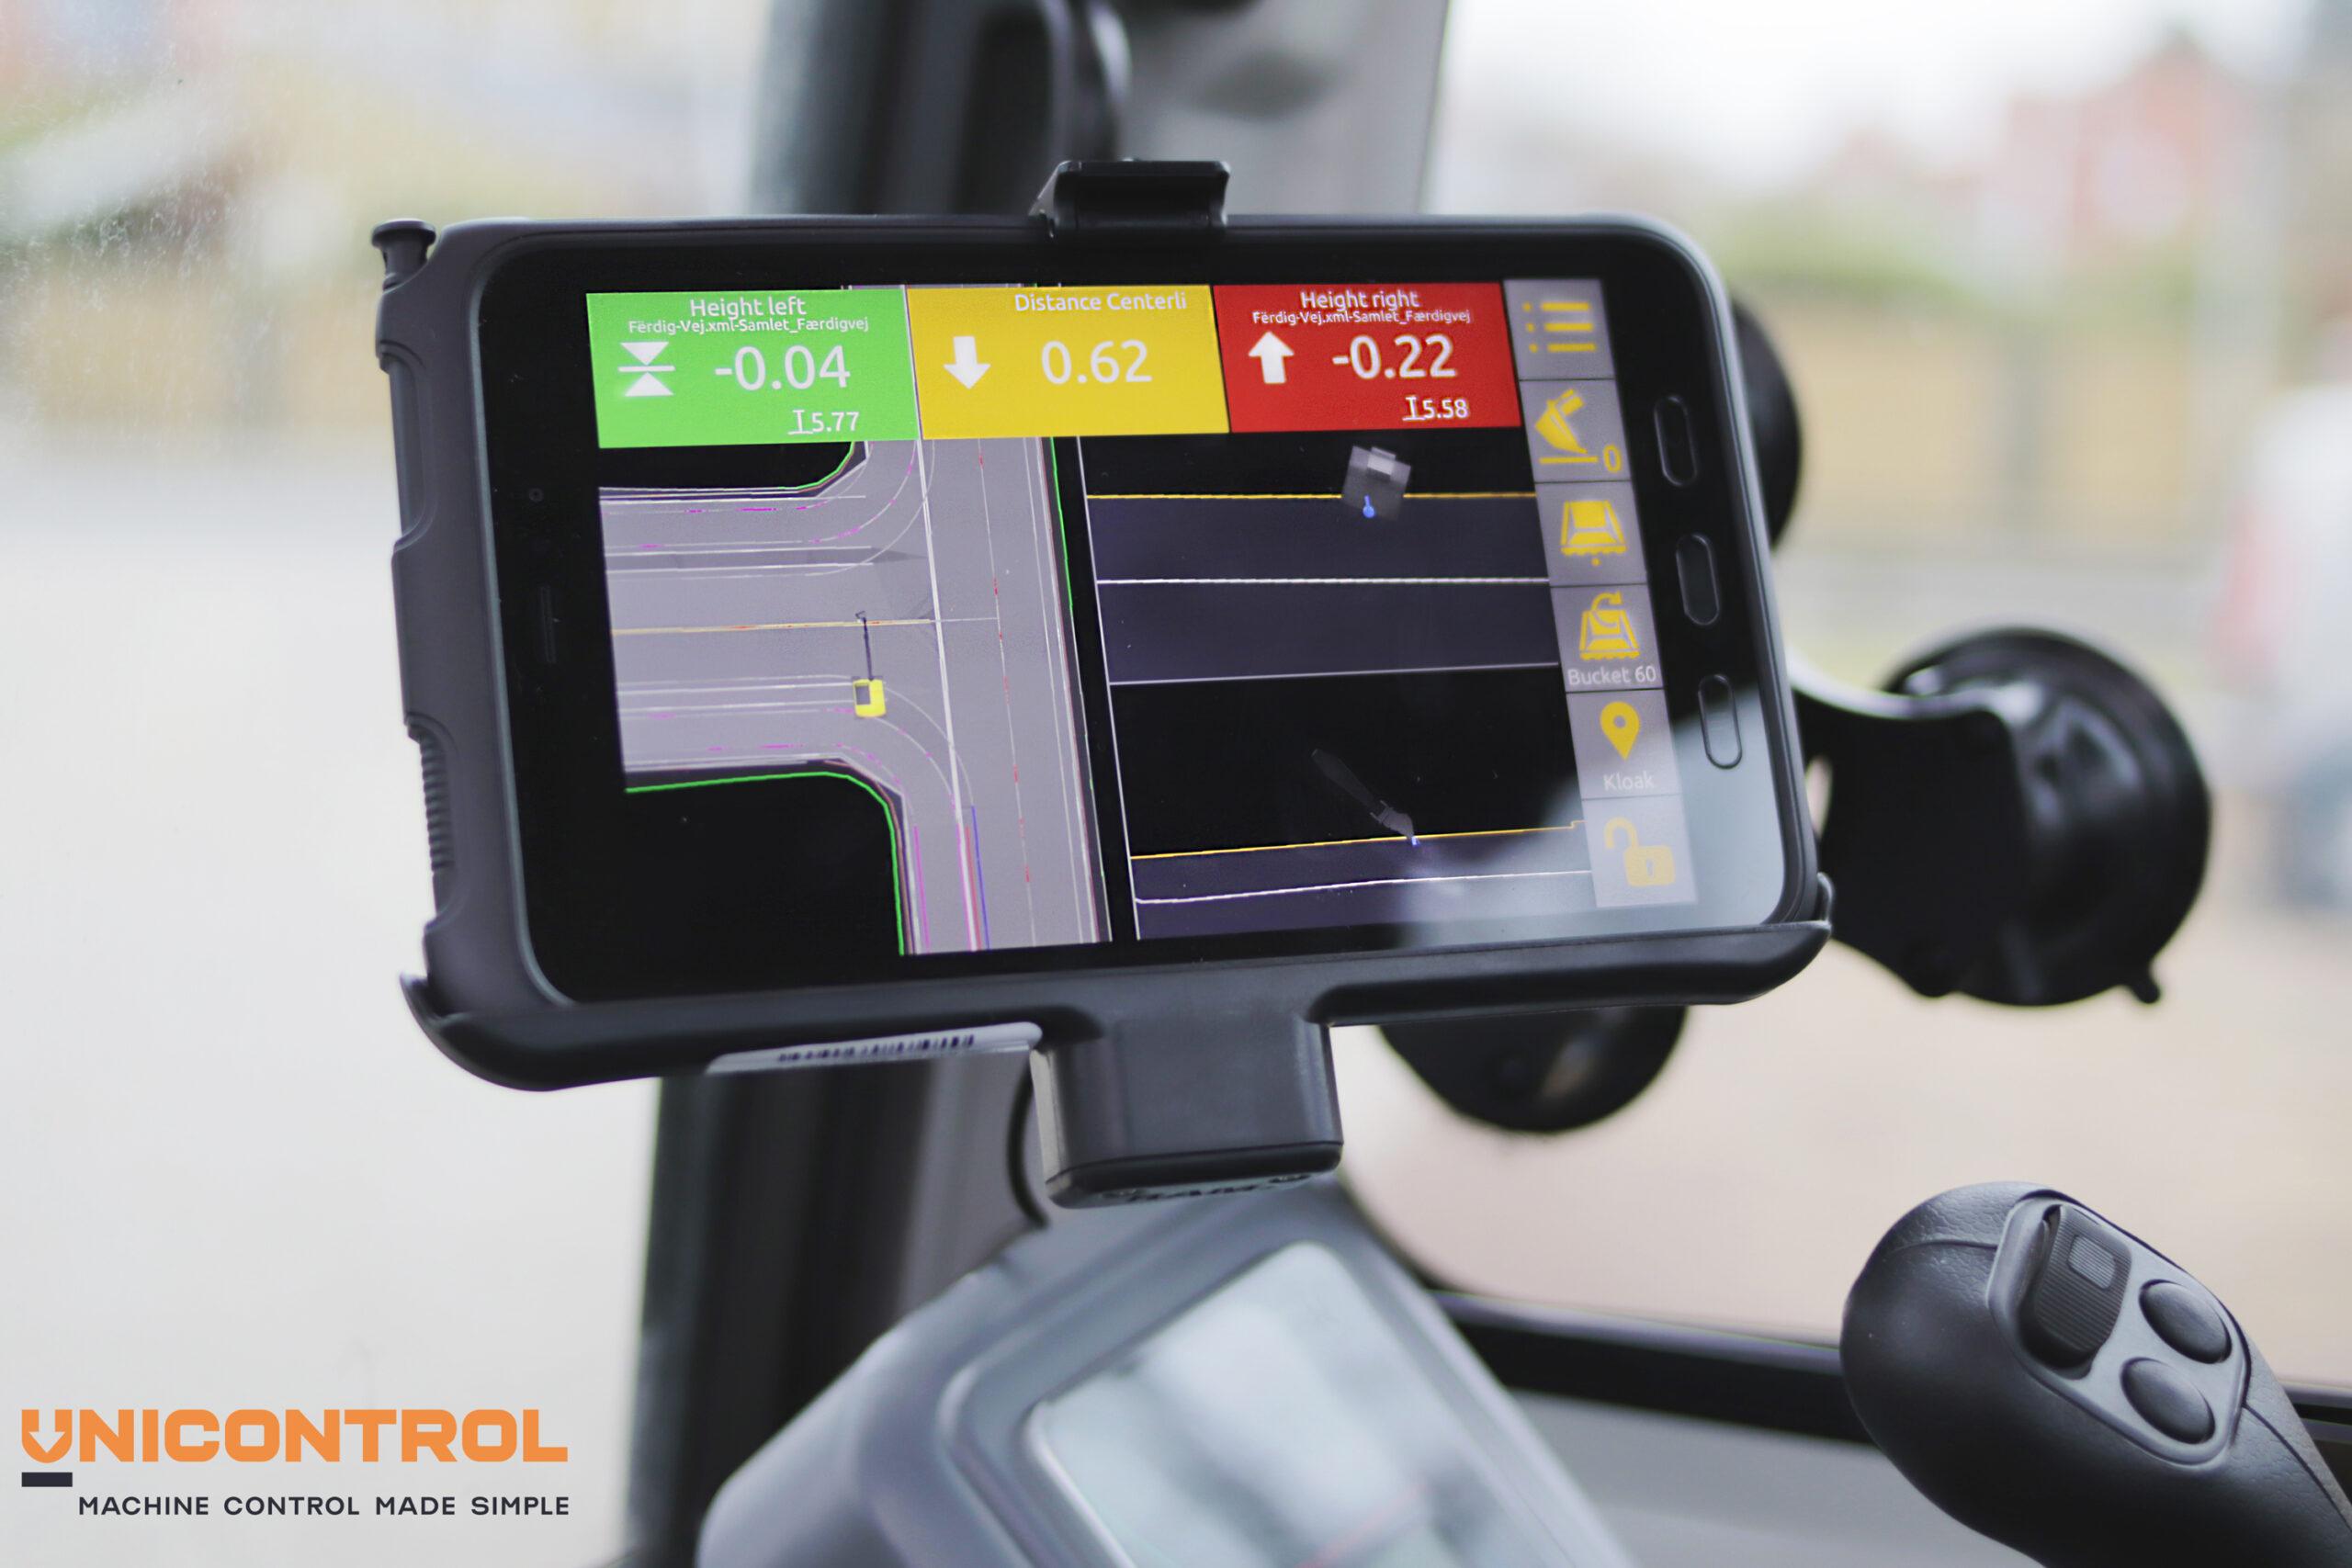 Unicontrol 3D machine control system tablet